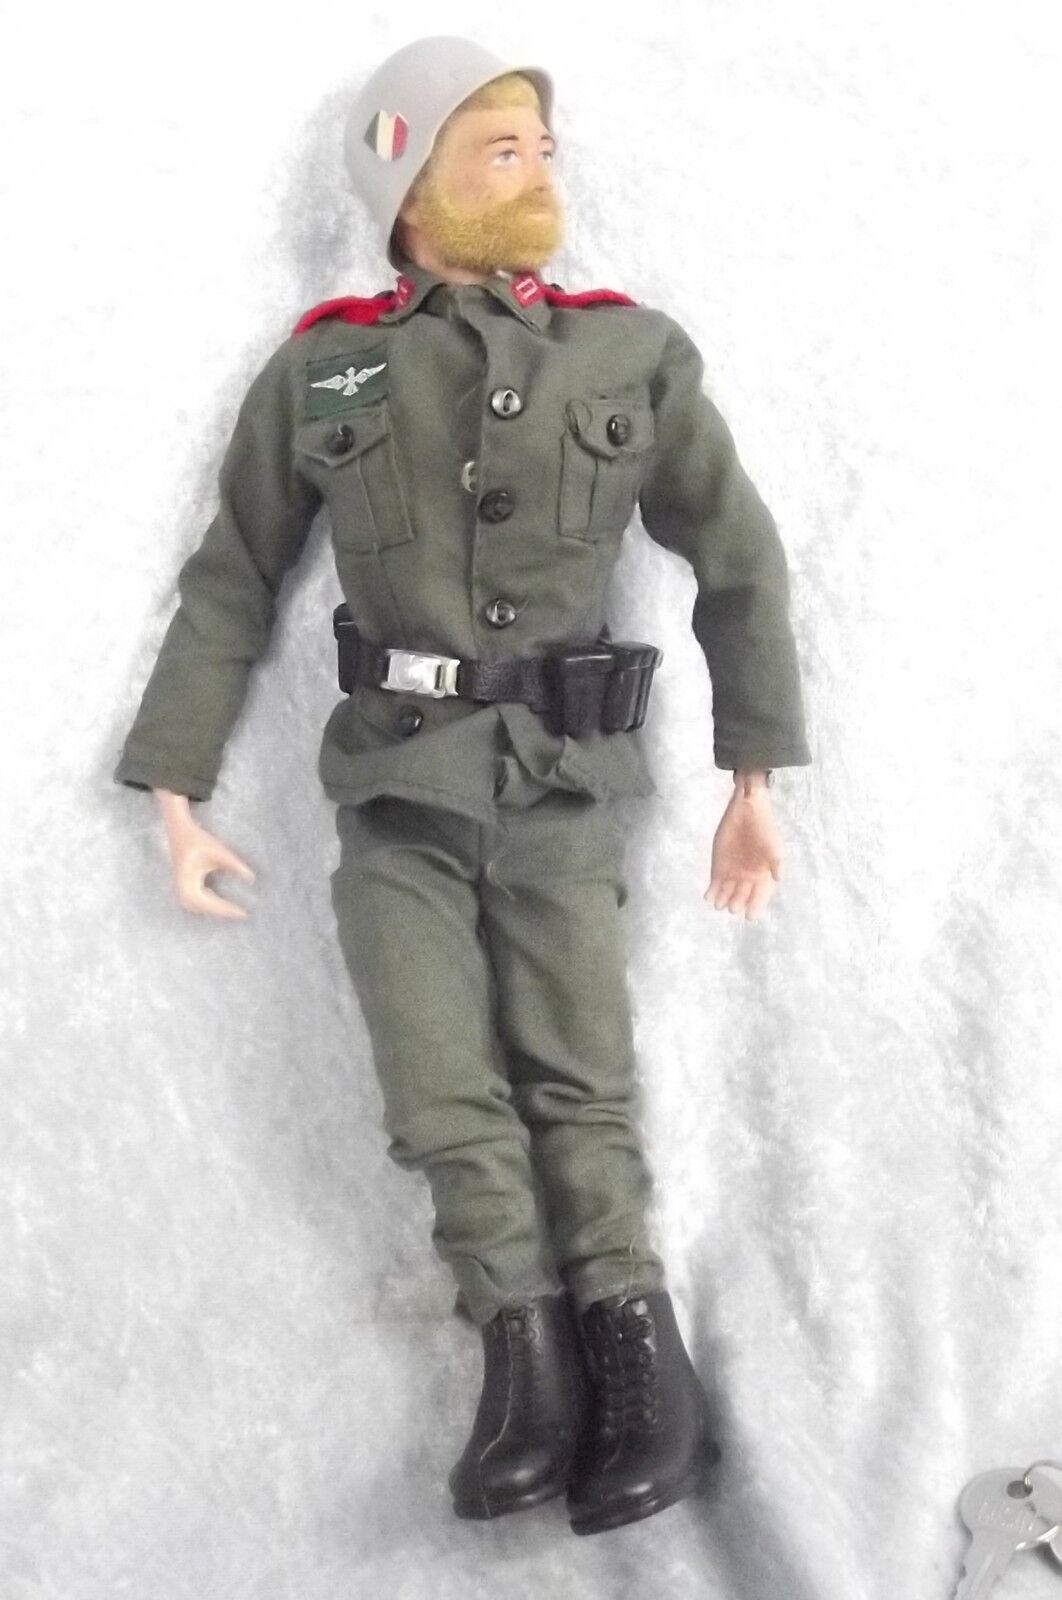 2nd Issue Action Man German Stormtrooper Uniform & Circa 1971 Fuzzy HaiROT